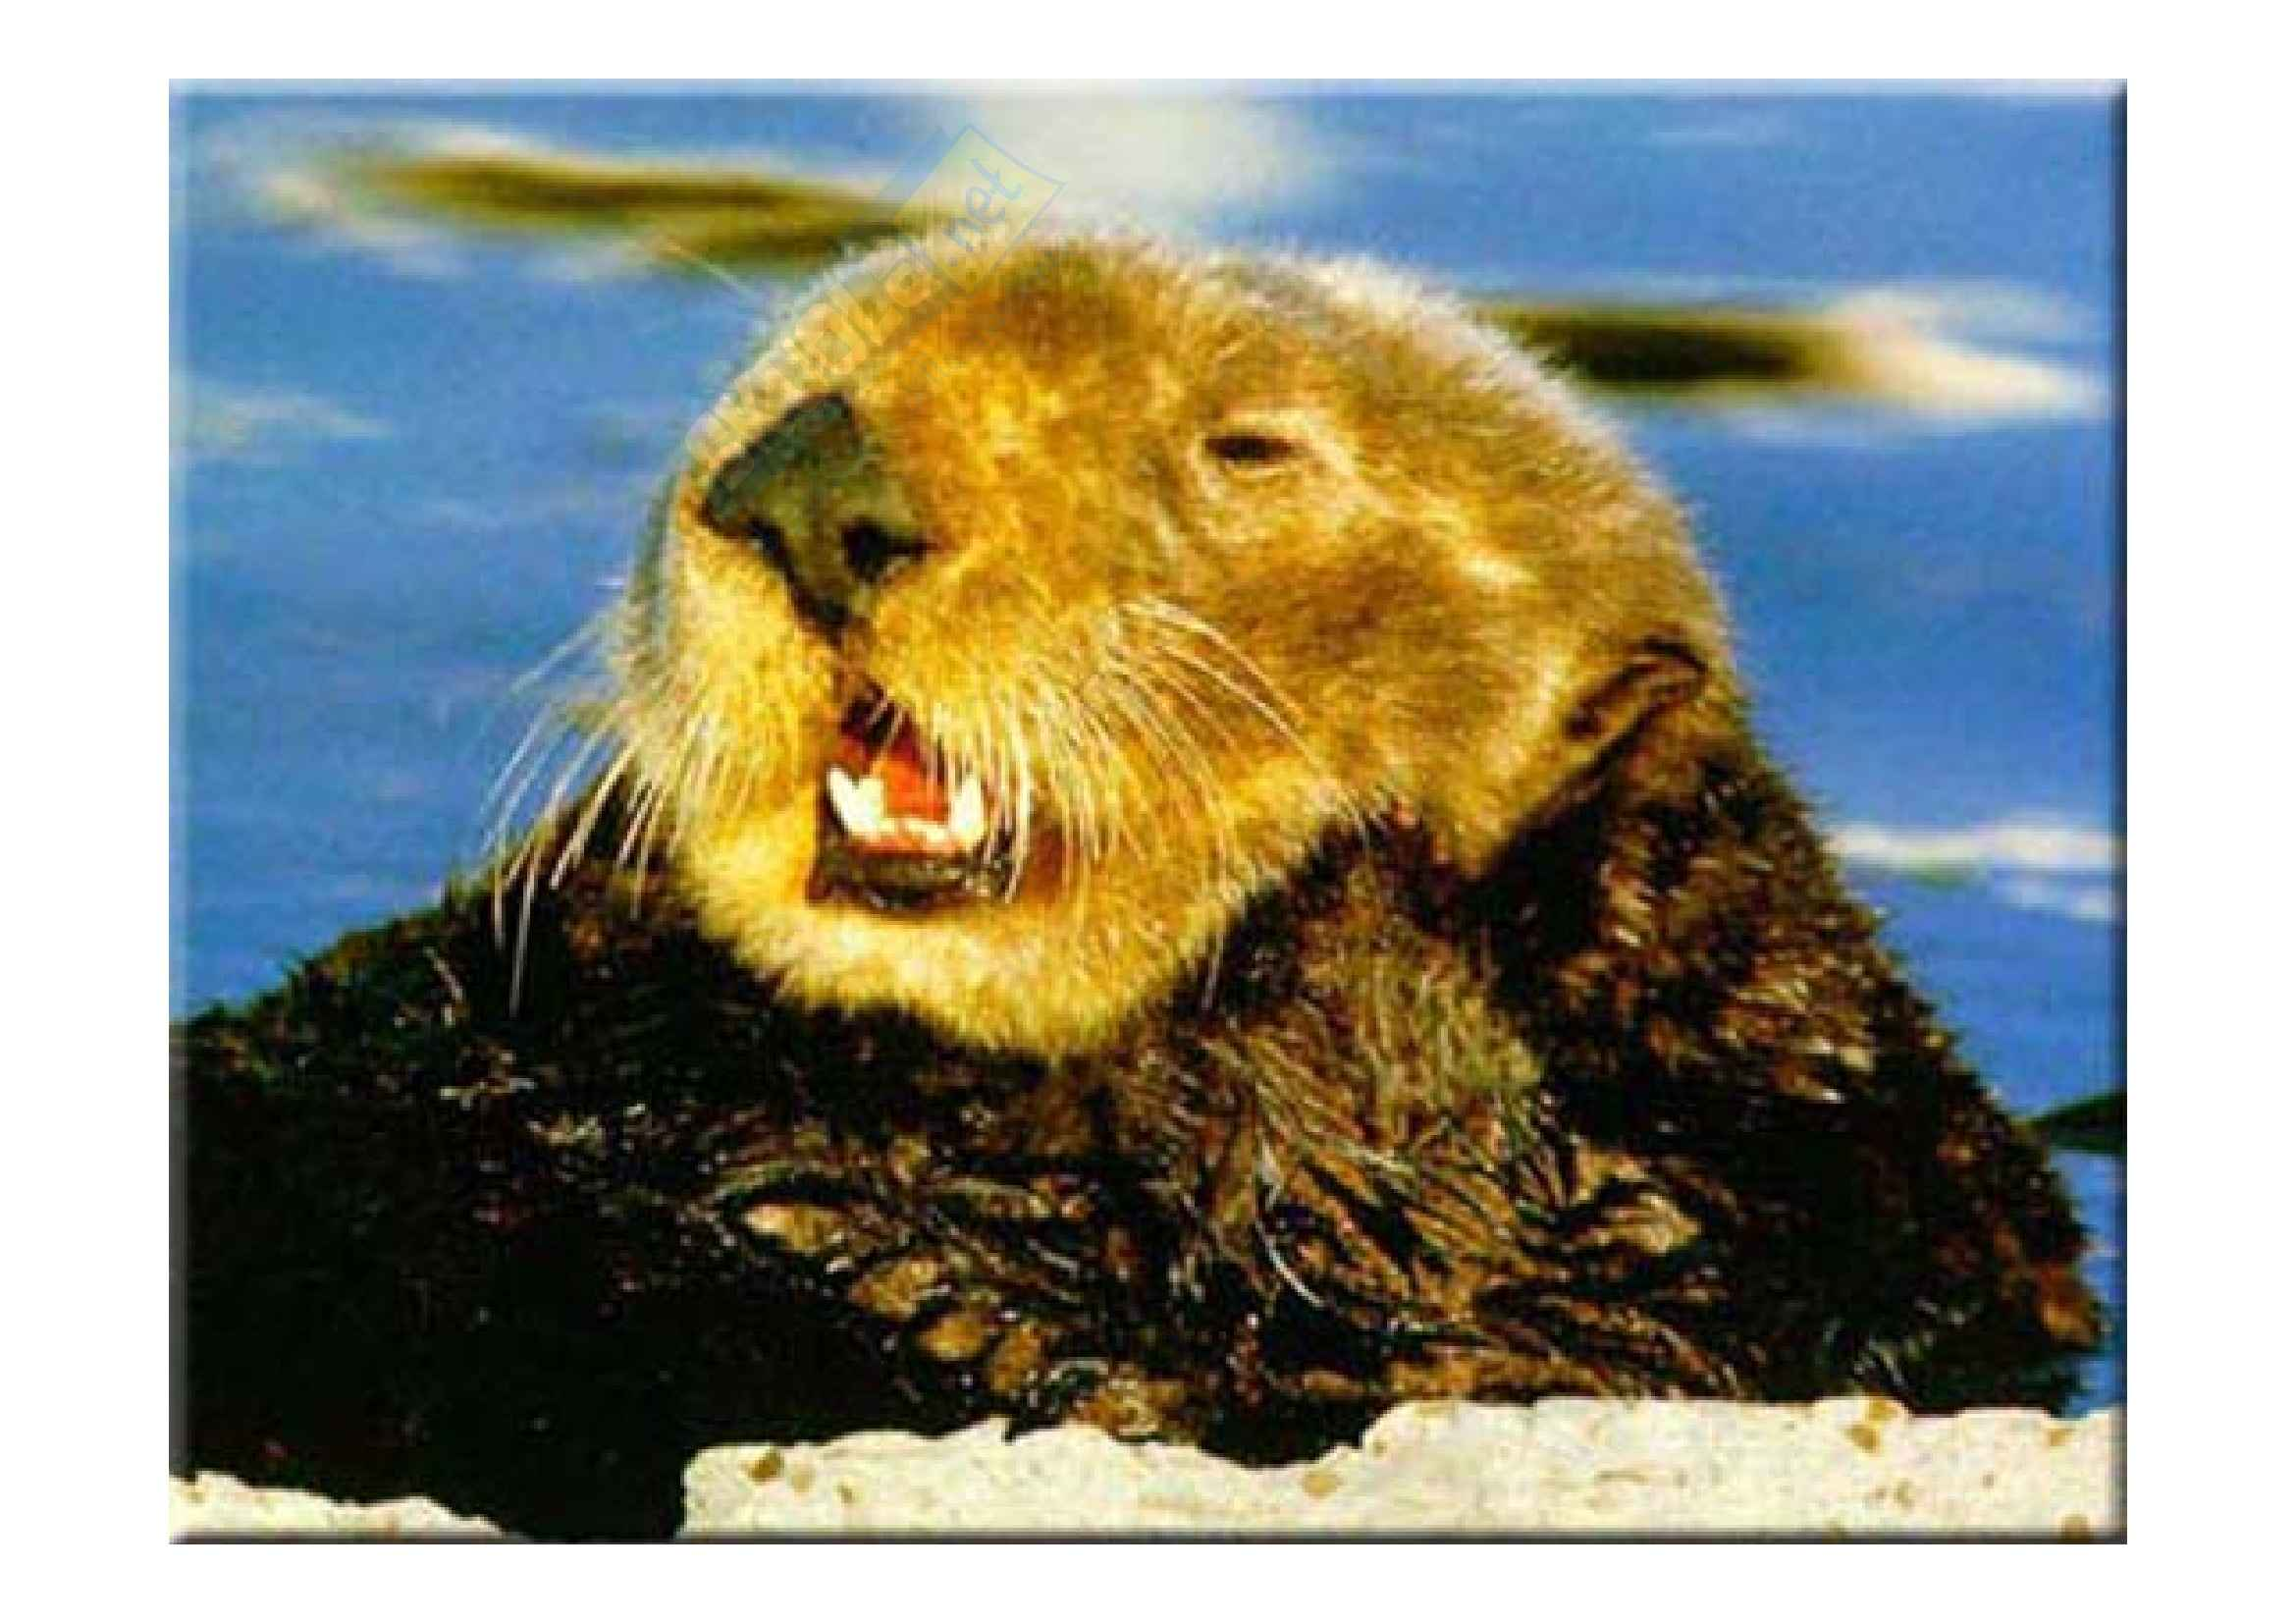 Zoologia - mammiferi marini Pag. 21